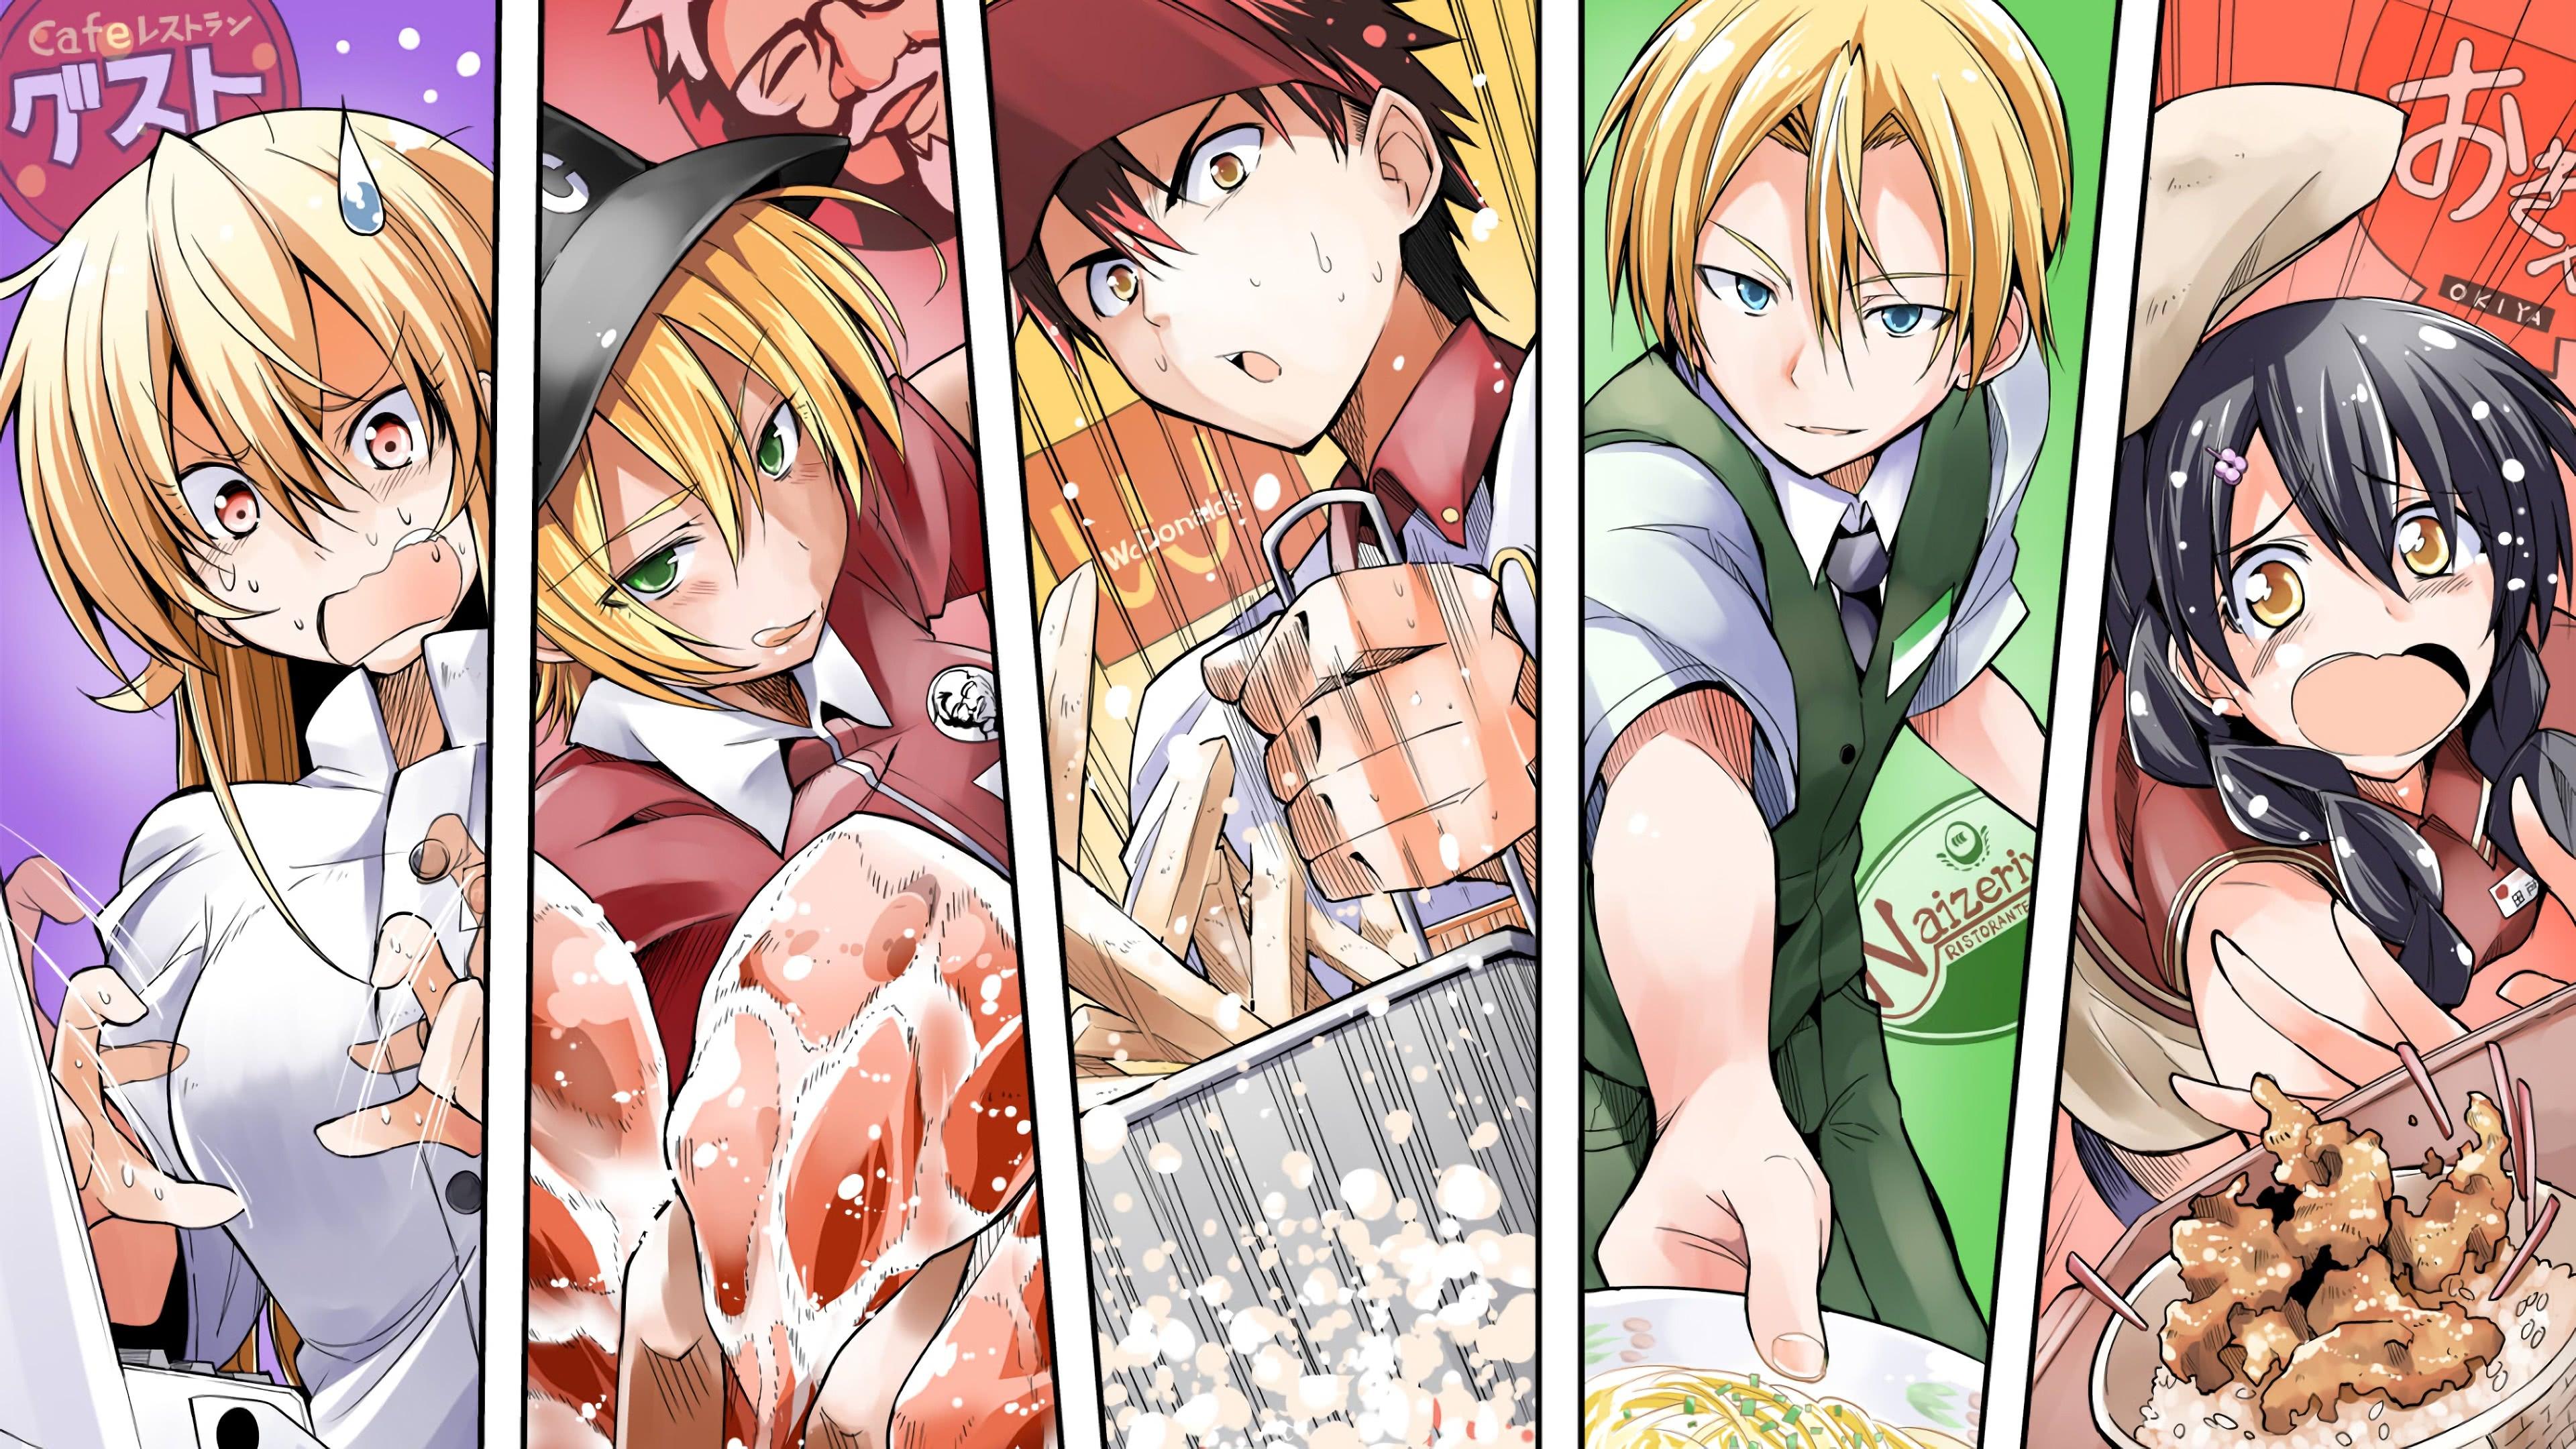 Food Wars Ikumi food wars shokugeki no soma erina nakiri ikumi mito uhd 4k